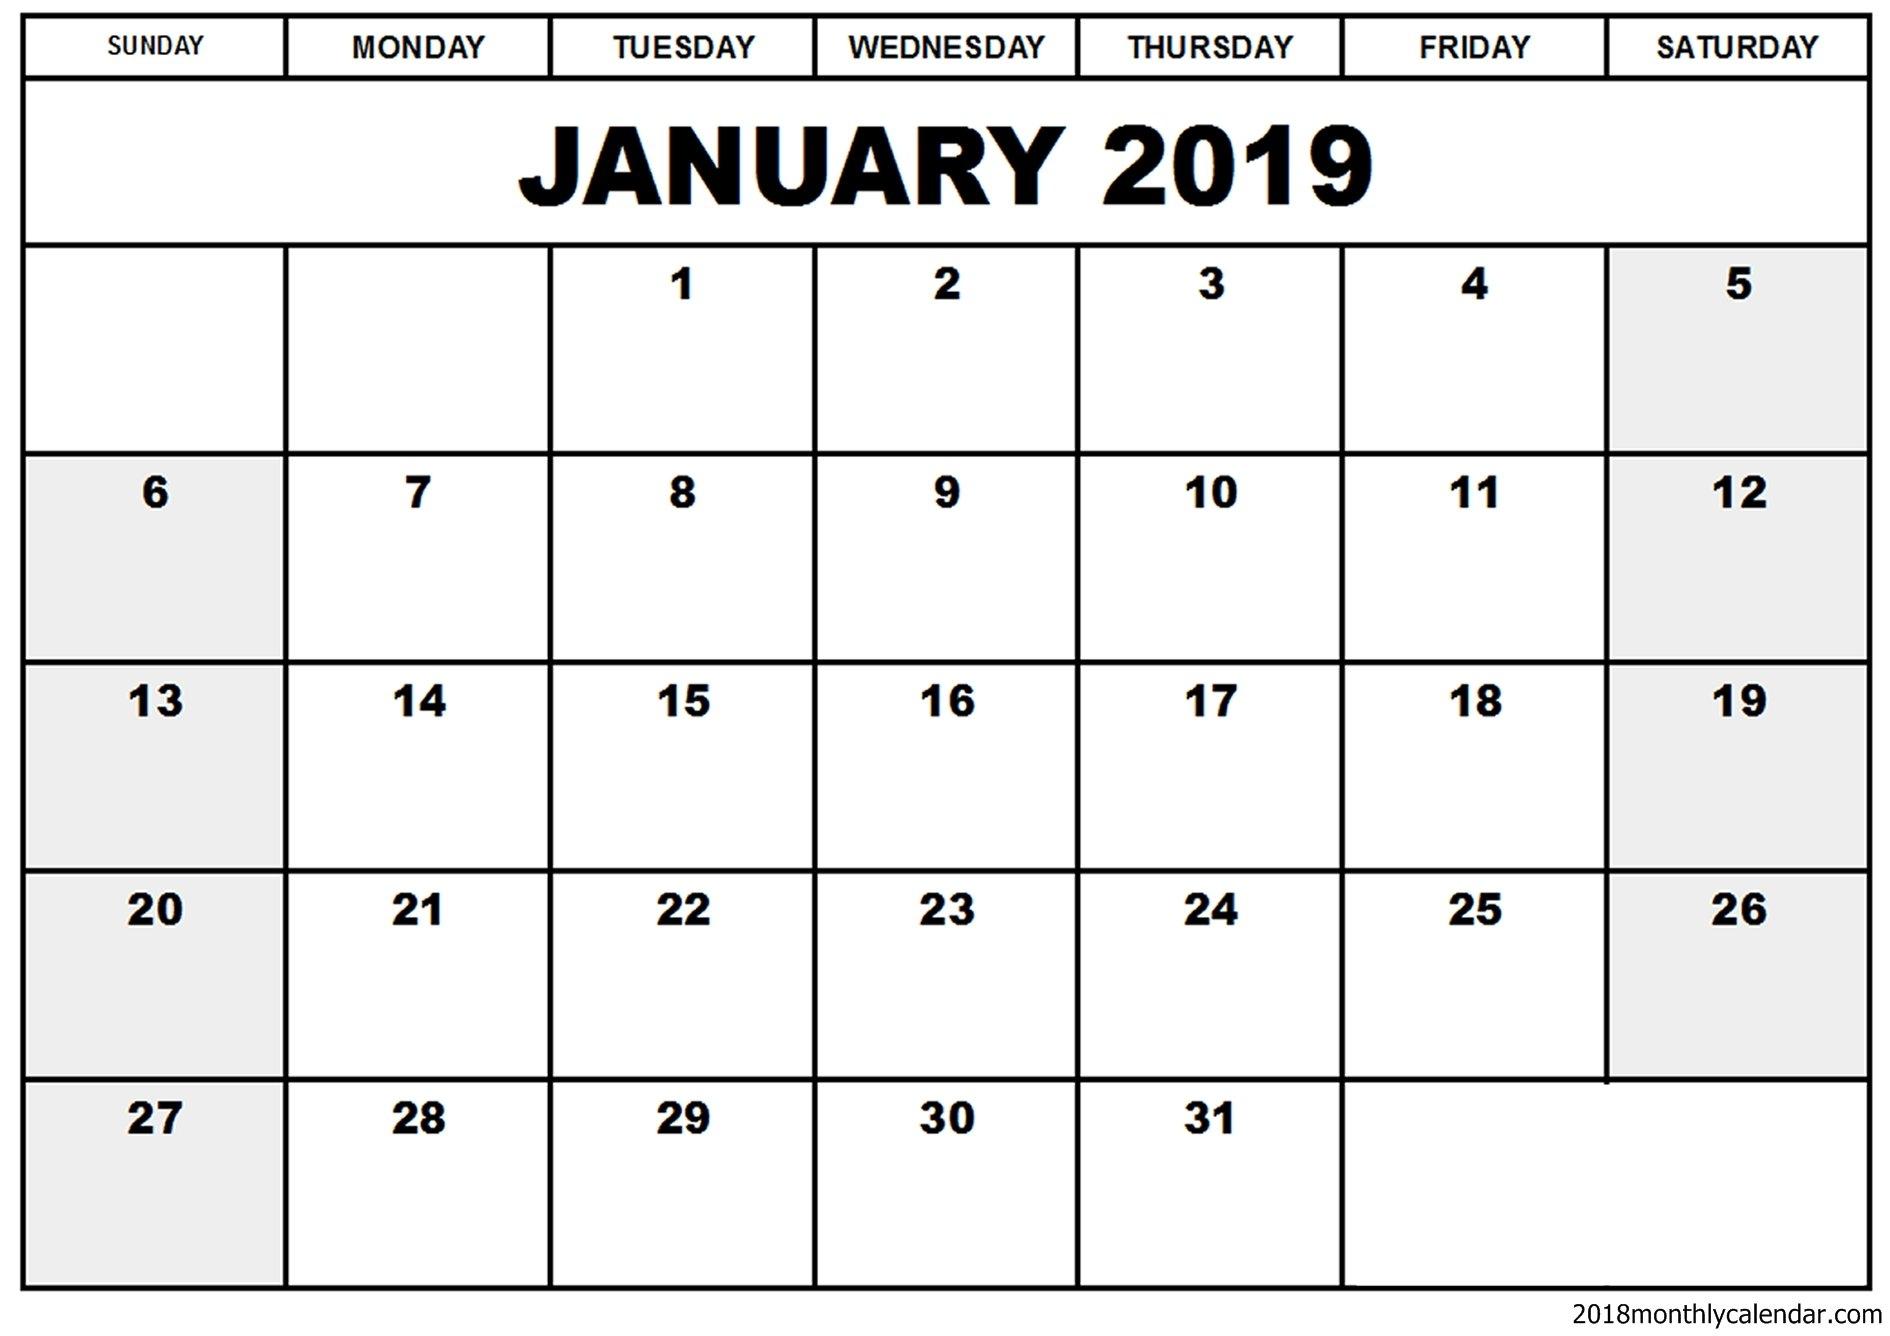 Free Printable January 2019 Editable Calendar [Download] | Printable 2019 Calendar You Can Edit